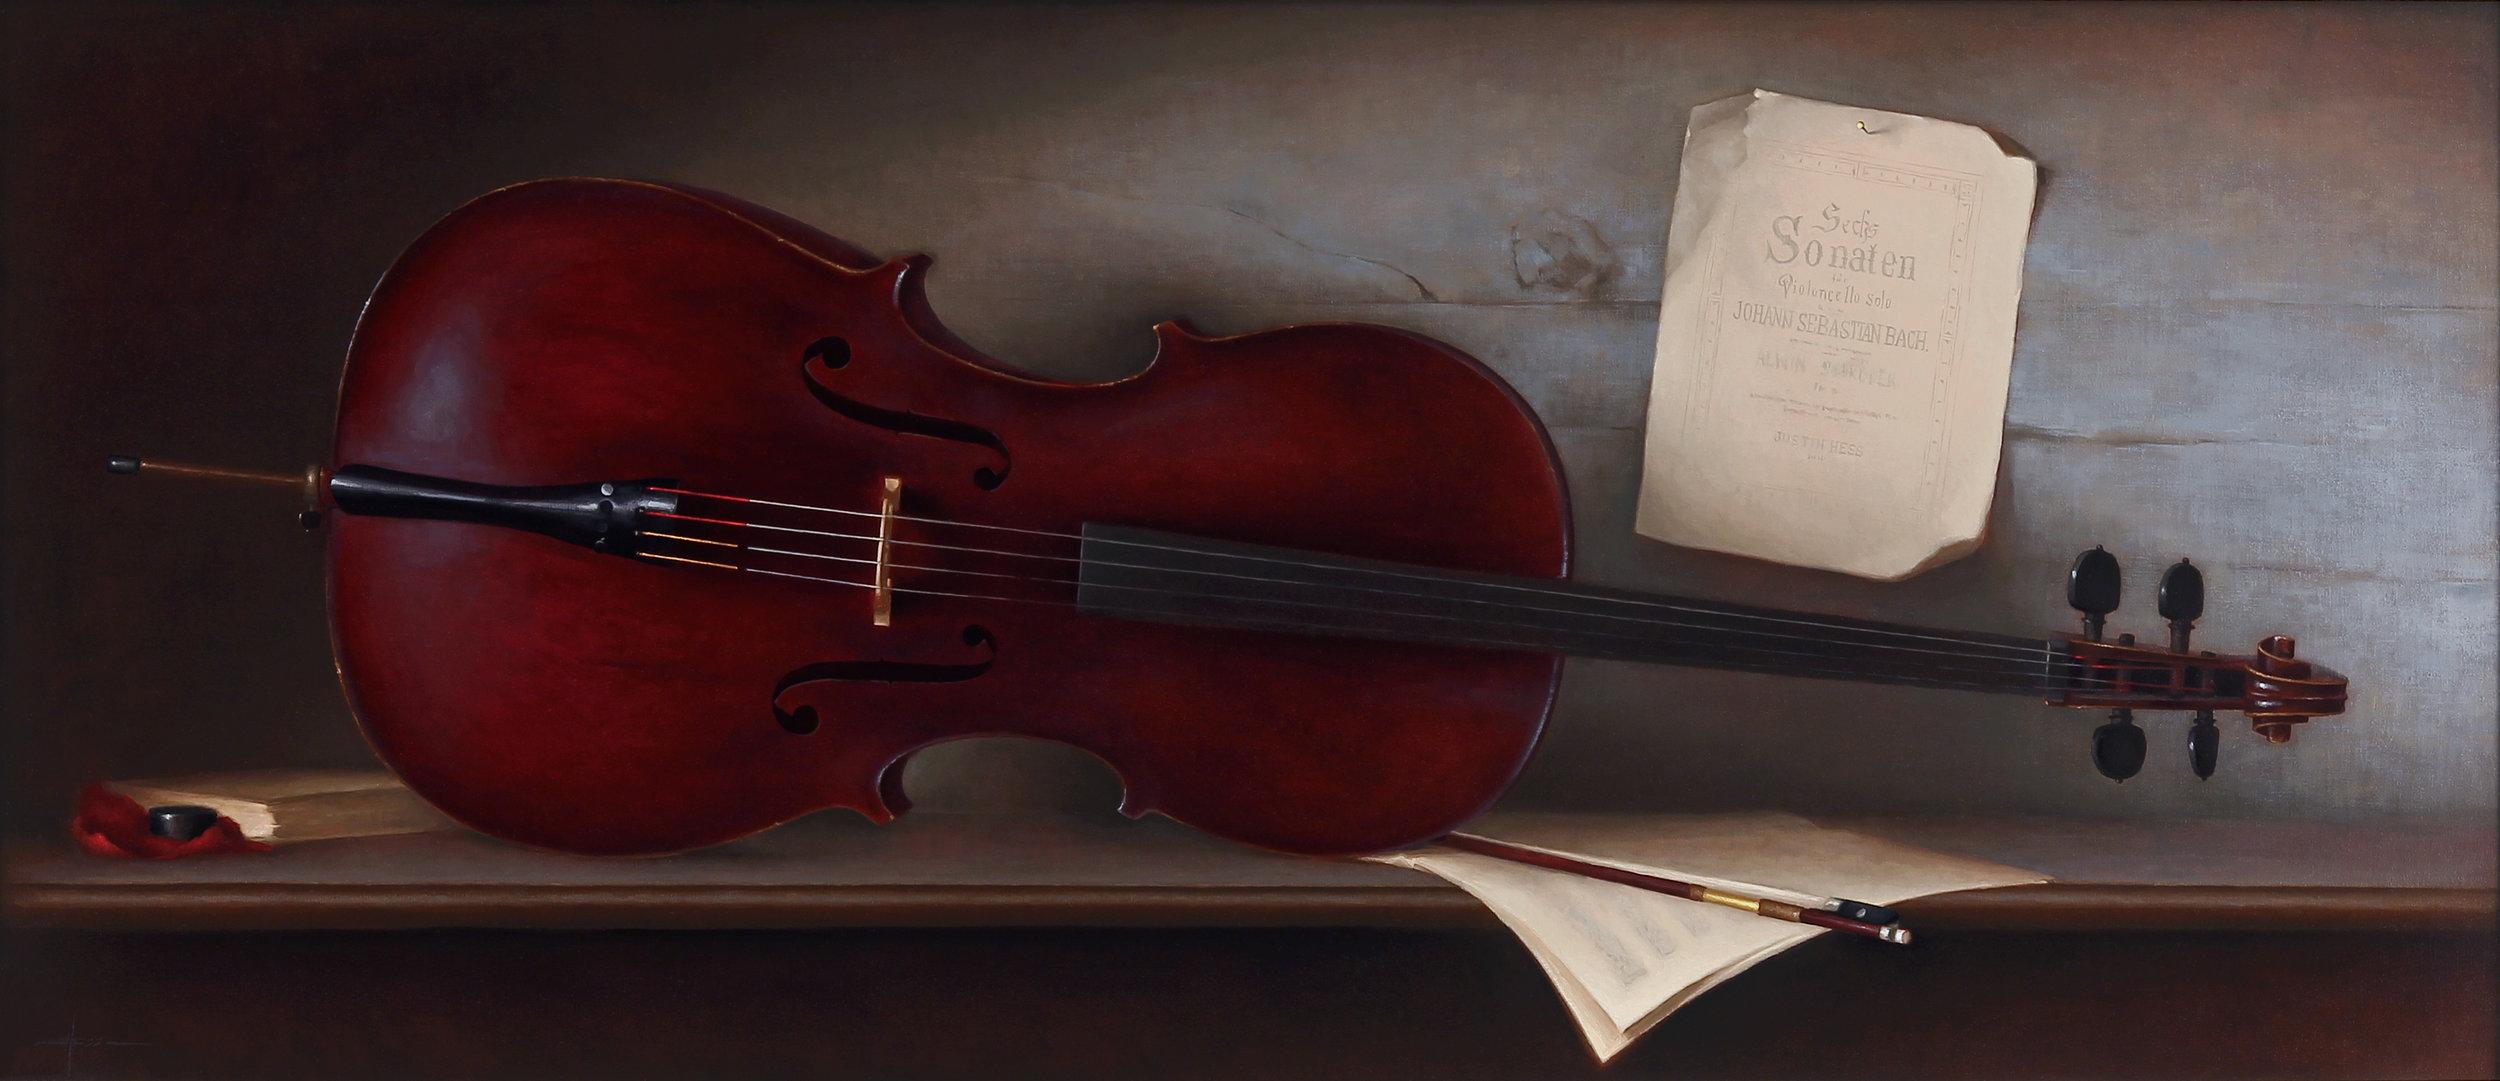 The Old Cello (300 dpi).jpg